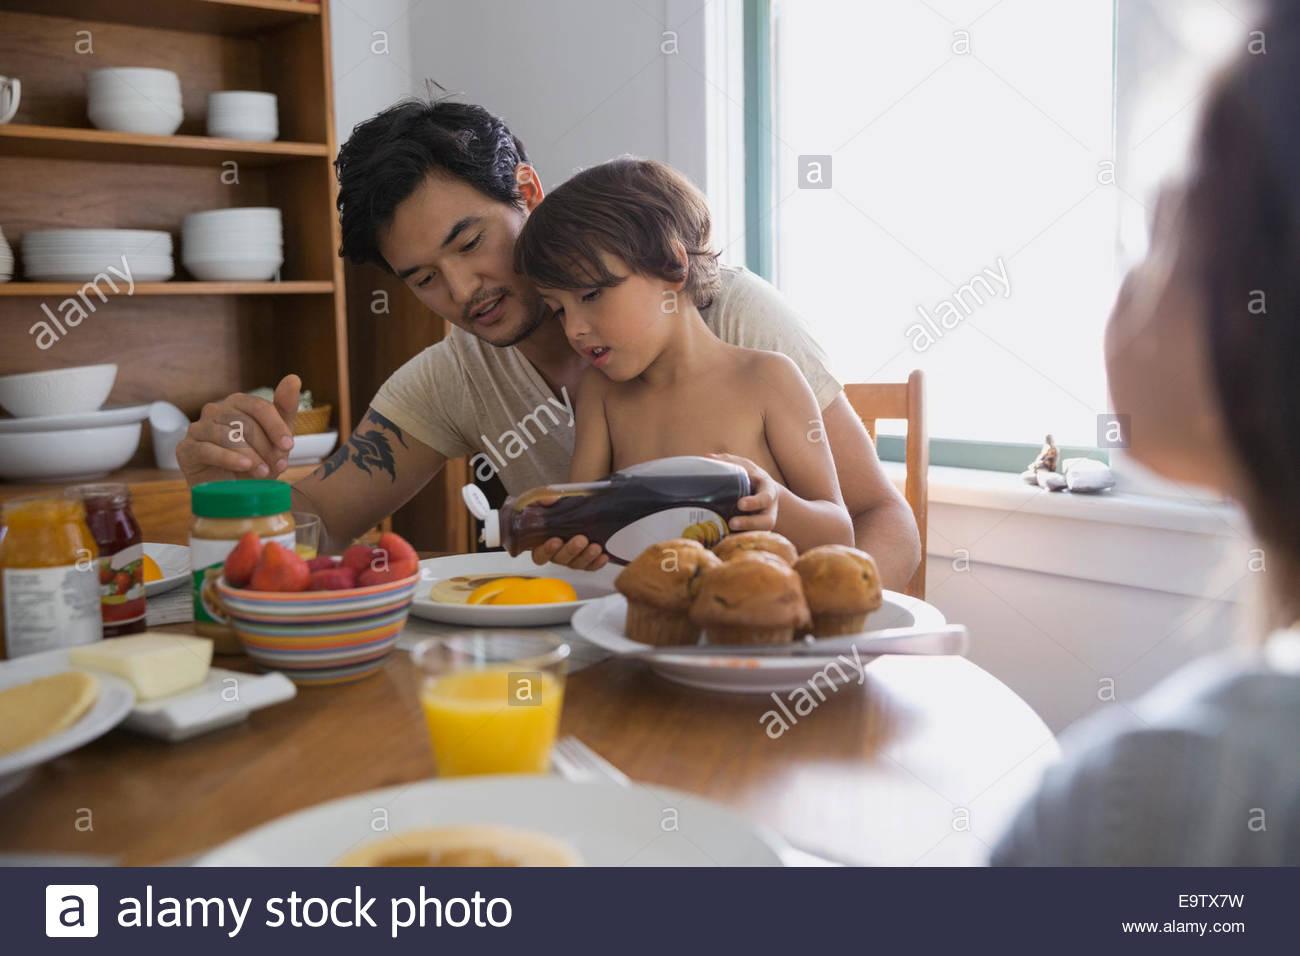 Padre Mira hijo pour jarabe en tortitas Imagen De Stock